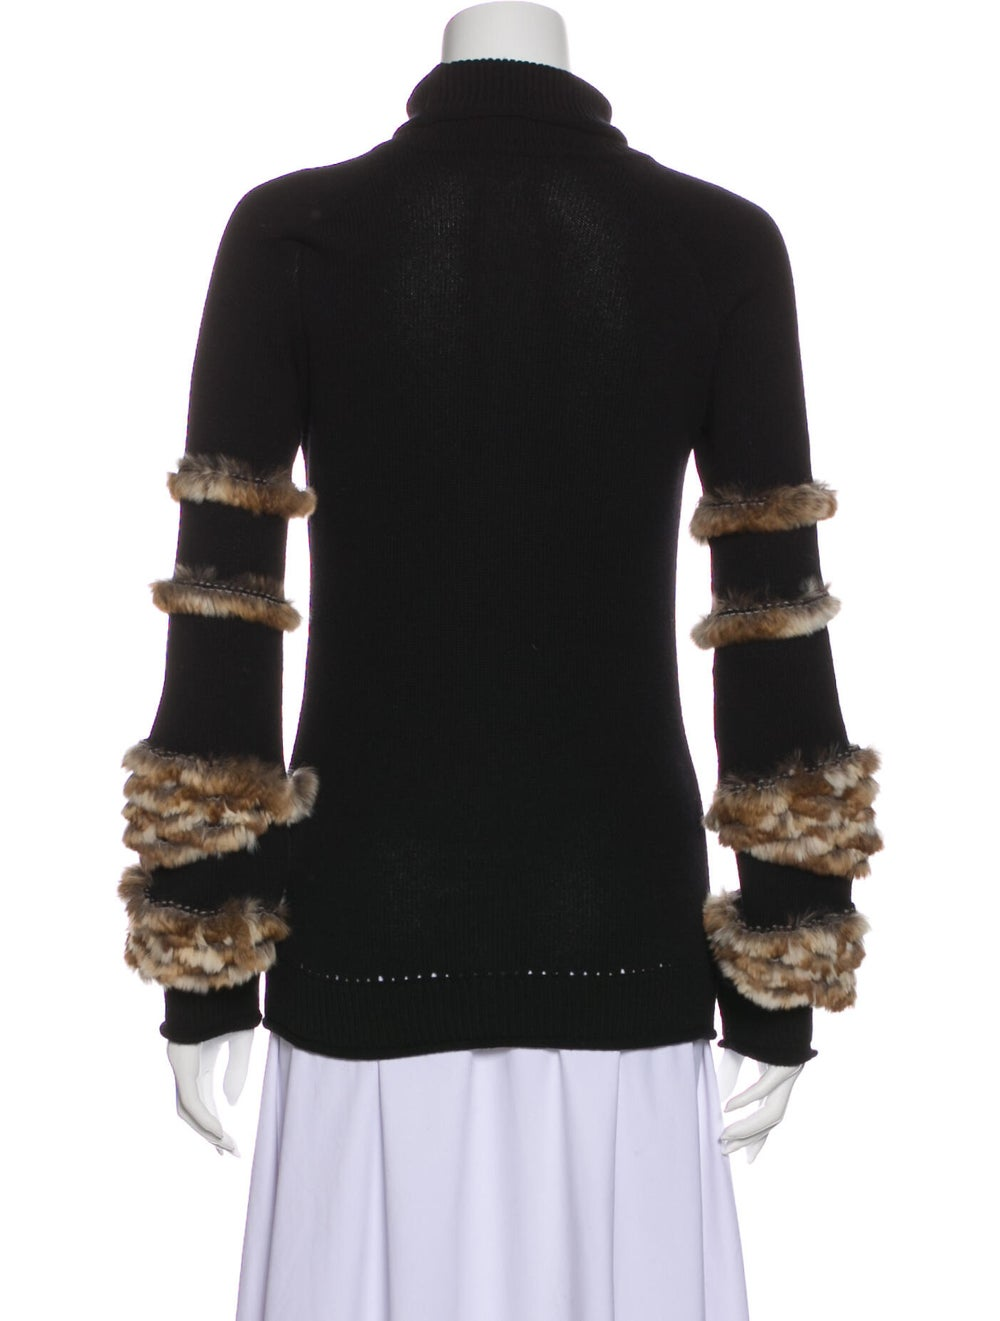 Fendi Cashmere Turtleneck Sweater Black - image 3